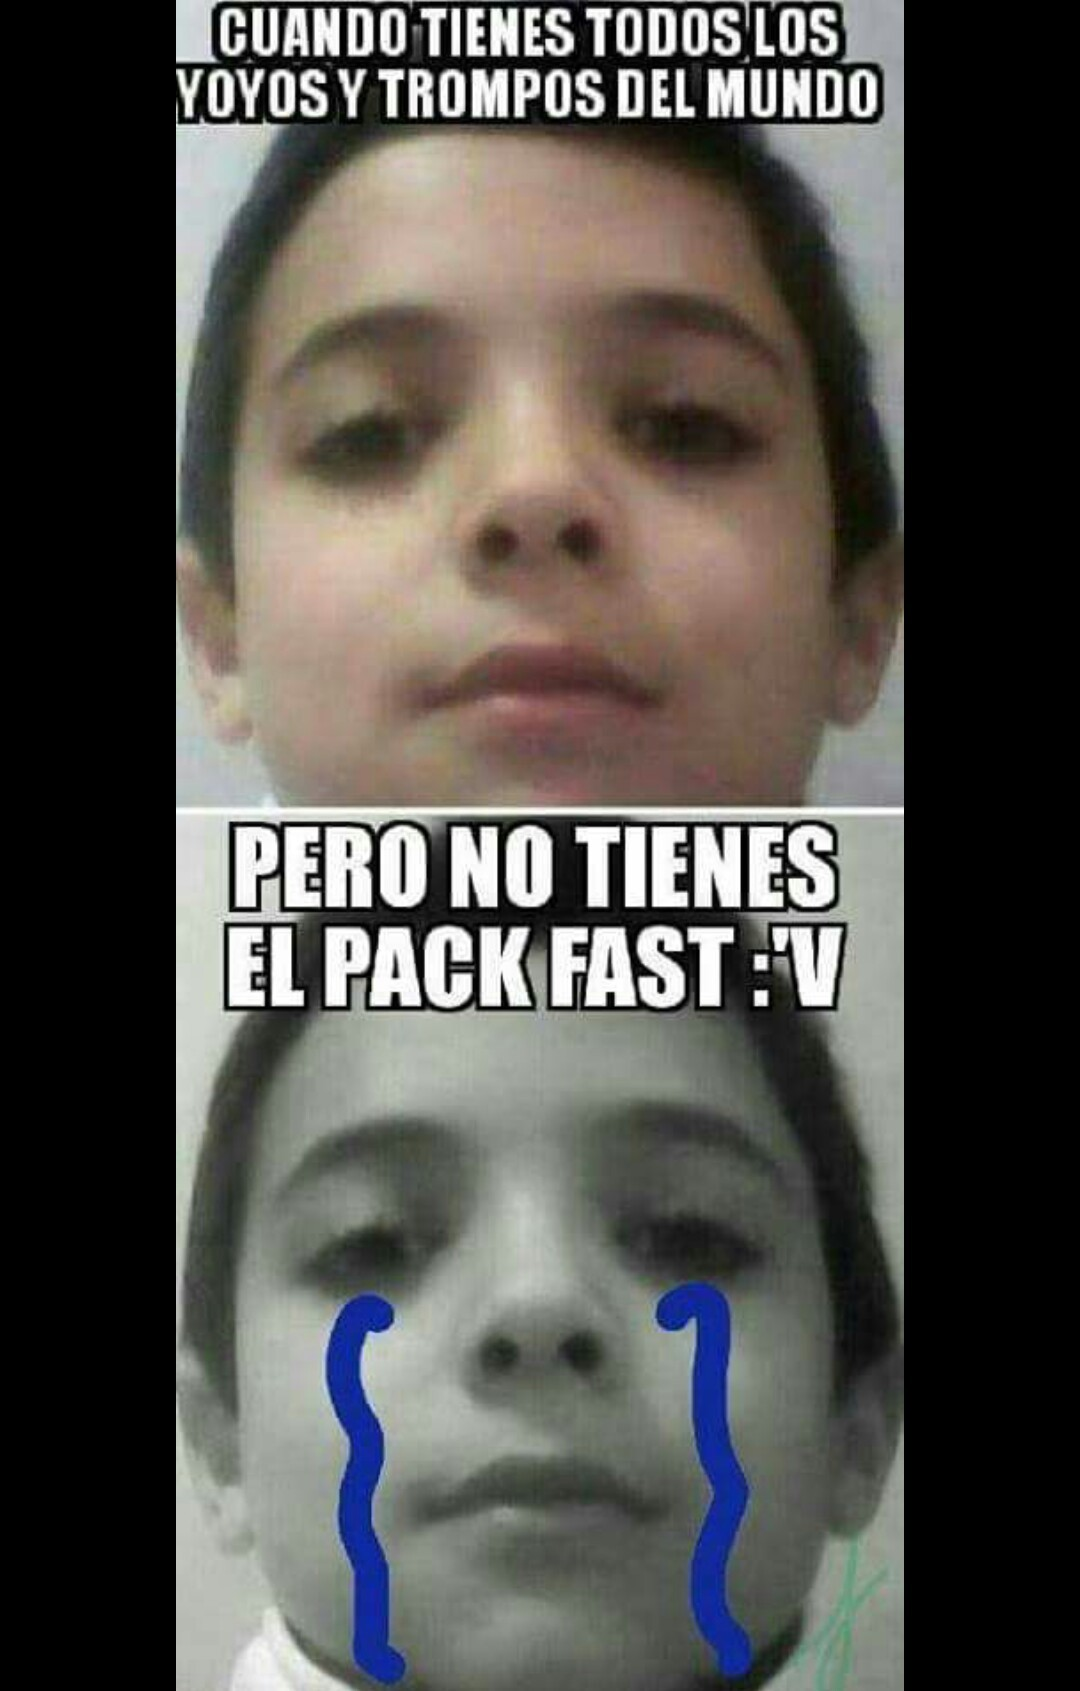 El pack fast - meme